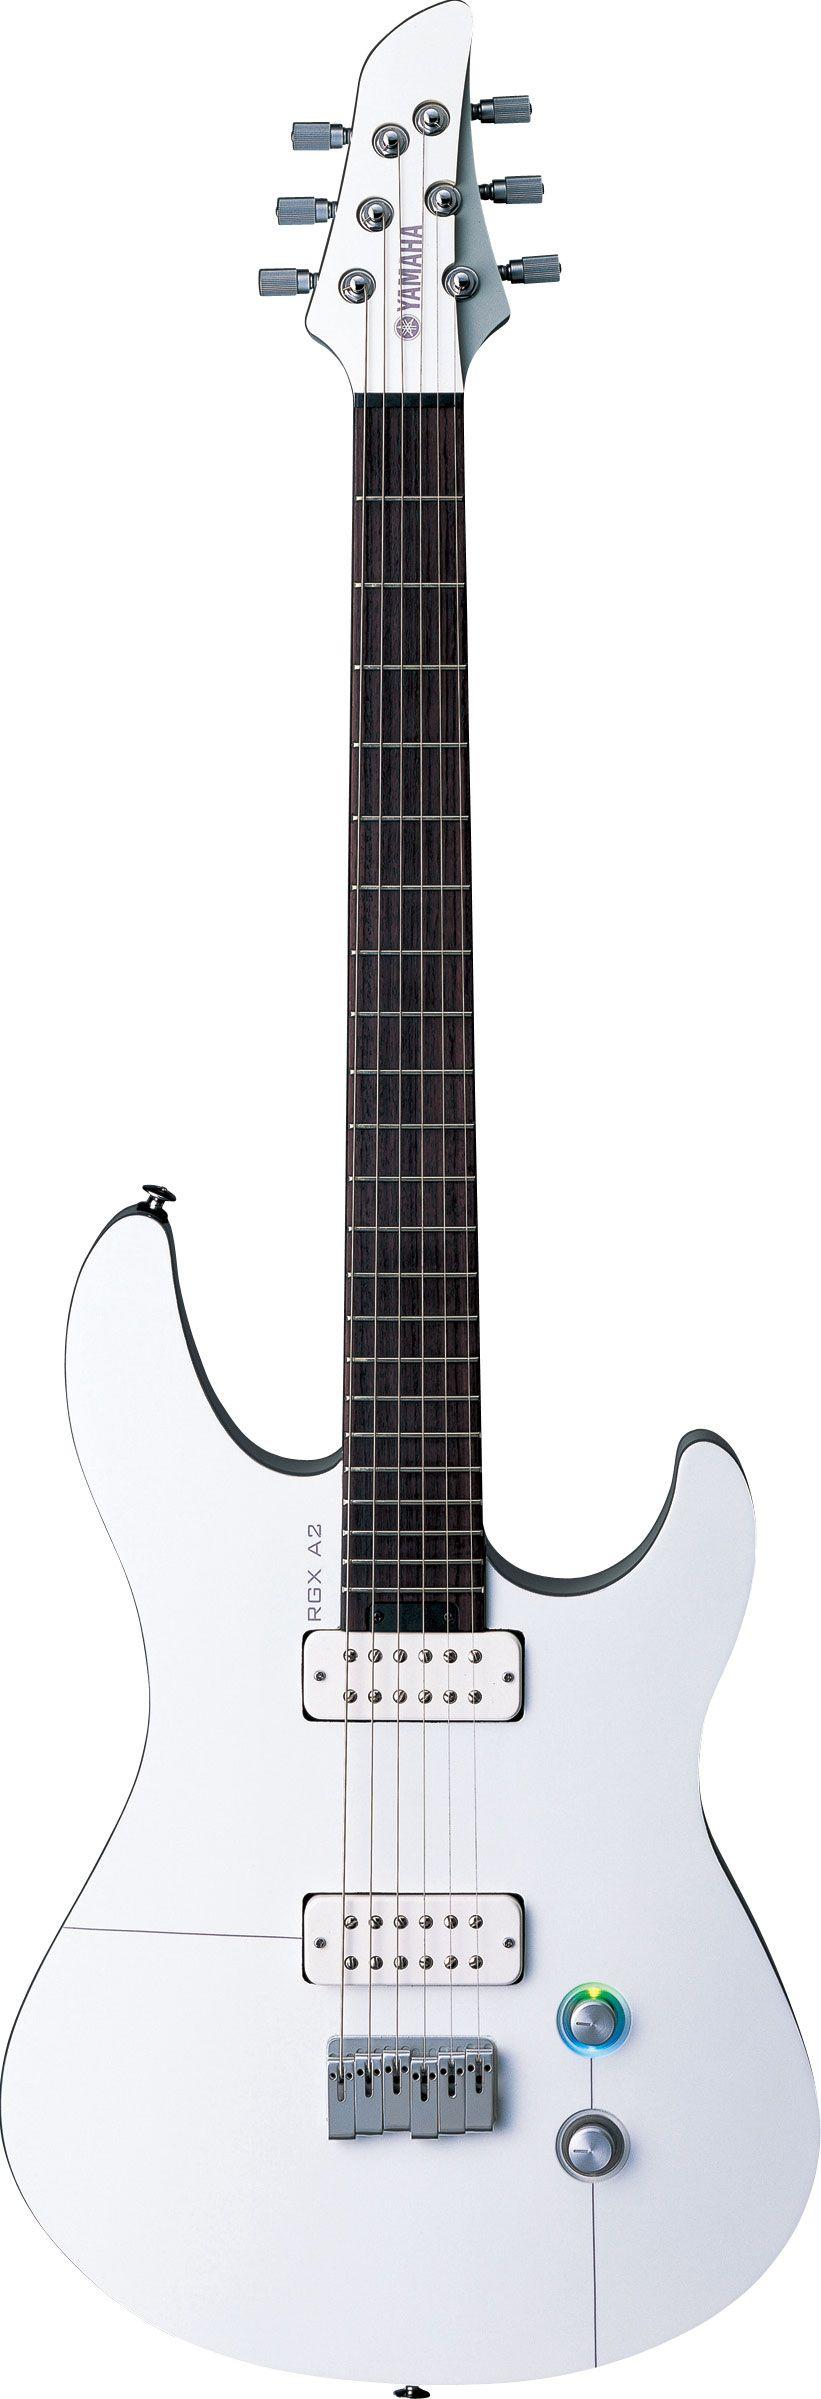 Yamaha Rgxa2 White And Aircraft Grey Electric Guitar Yamaha Guitar Yamaha Bass Guitar Guitar